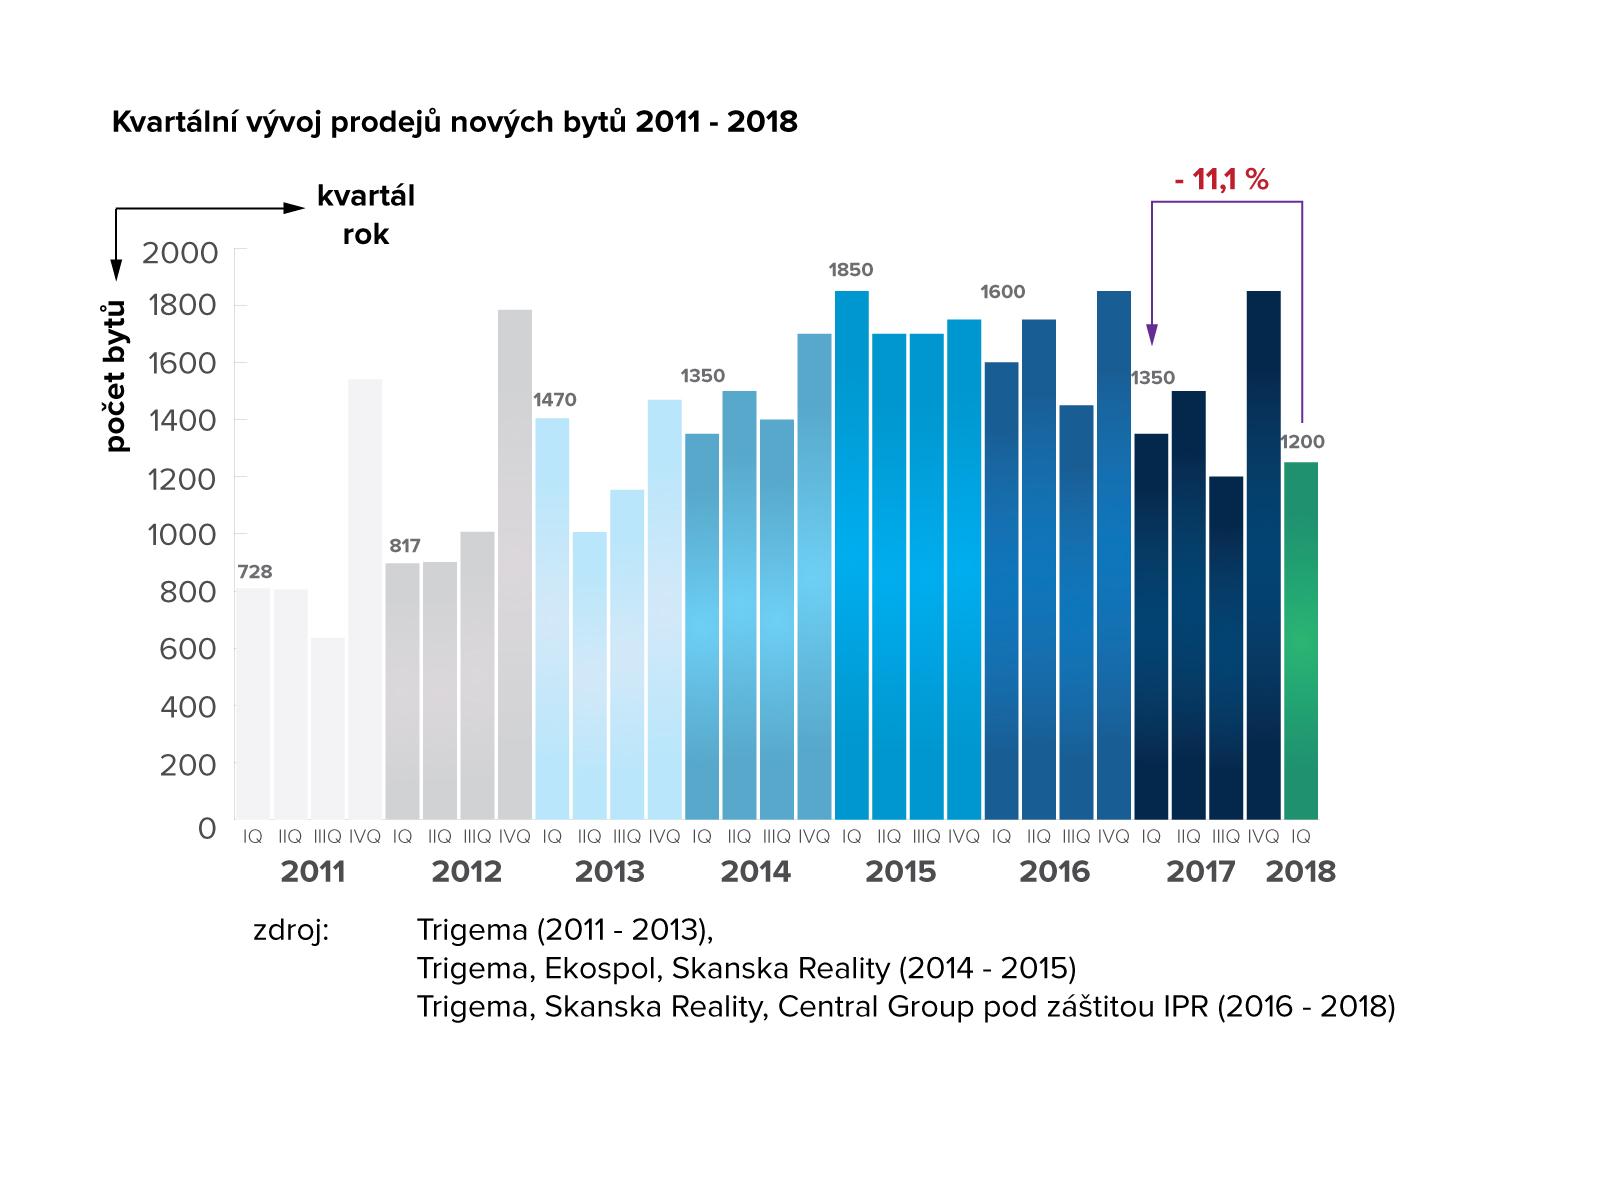 Vývoj prodajů nových bytů v Praze 2011-2018